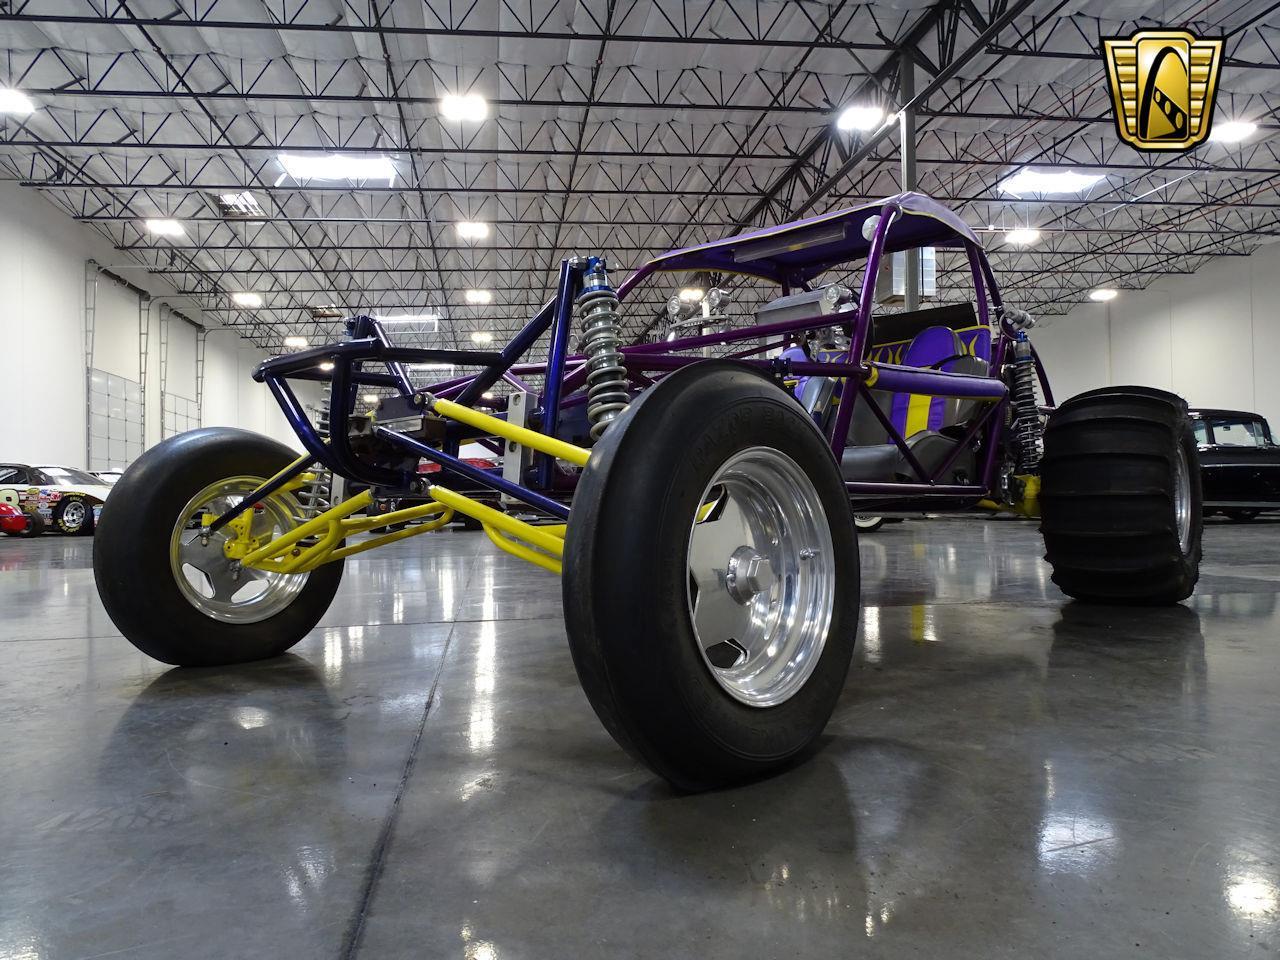 For Sale: 2018 Custom Sandrail in Deer Valley, Arizona